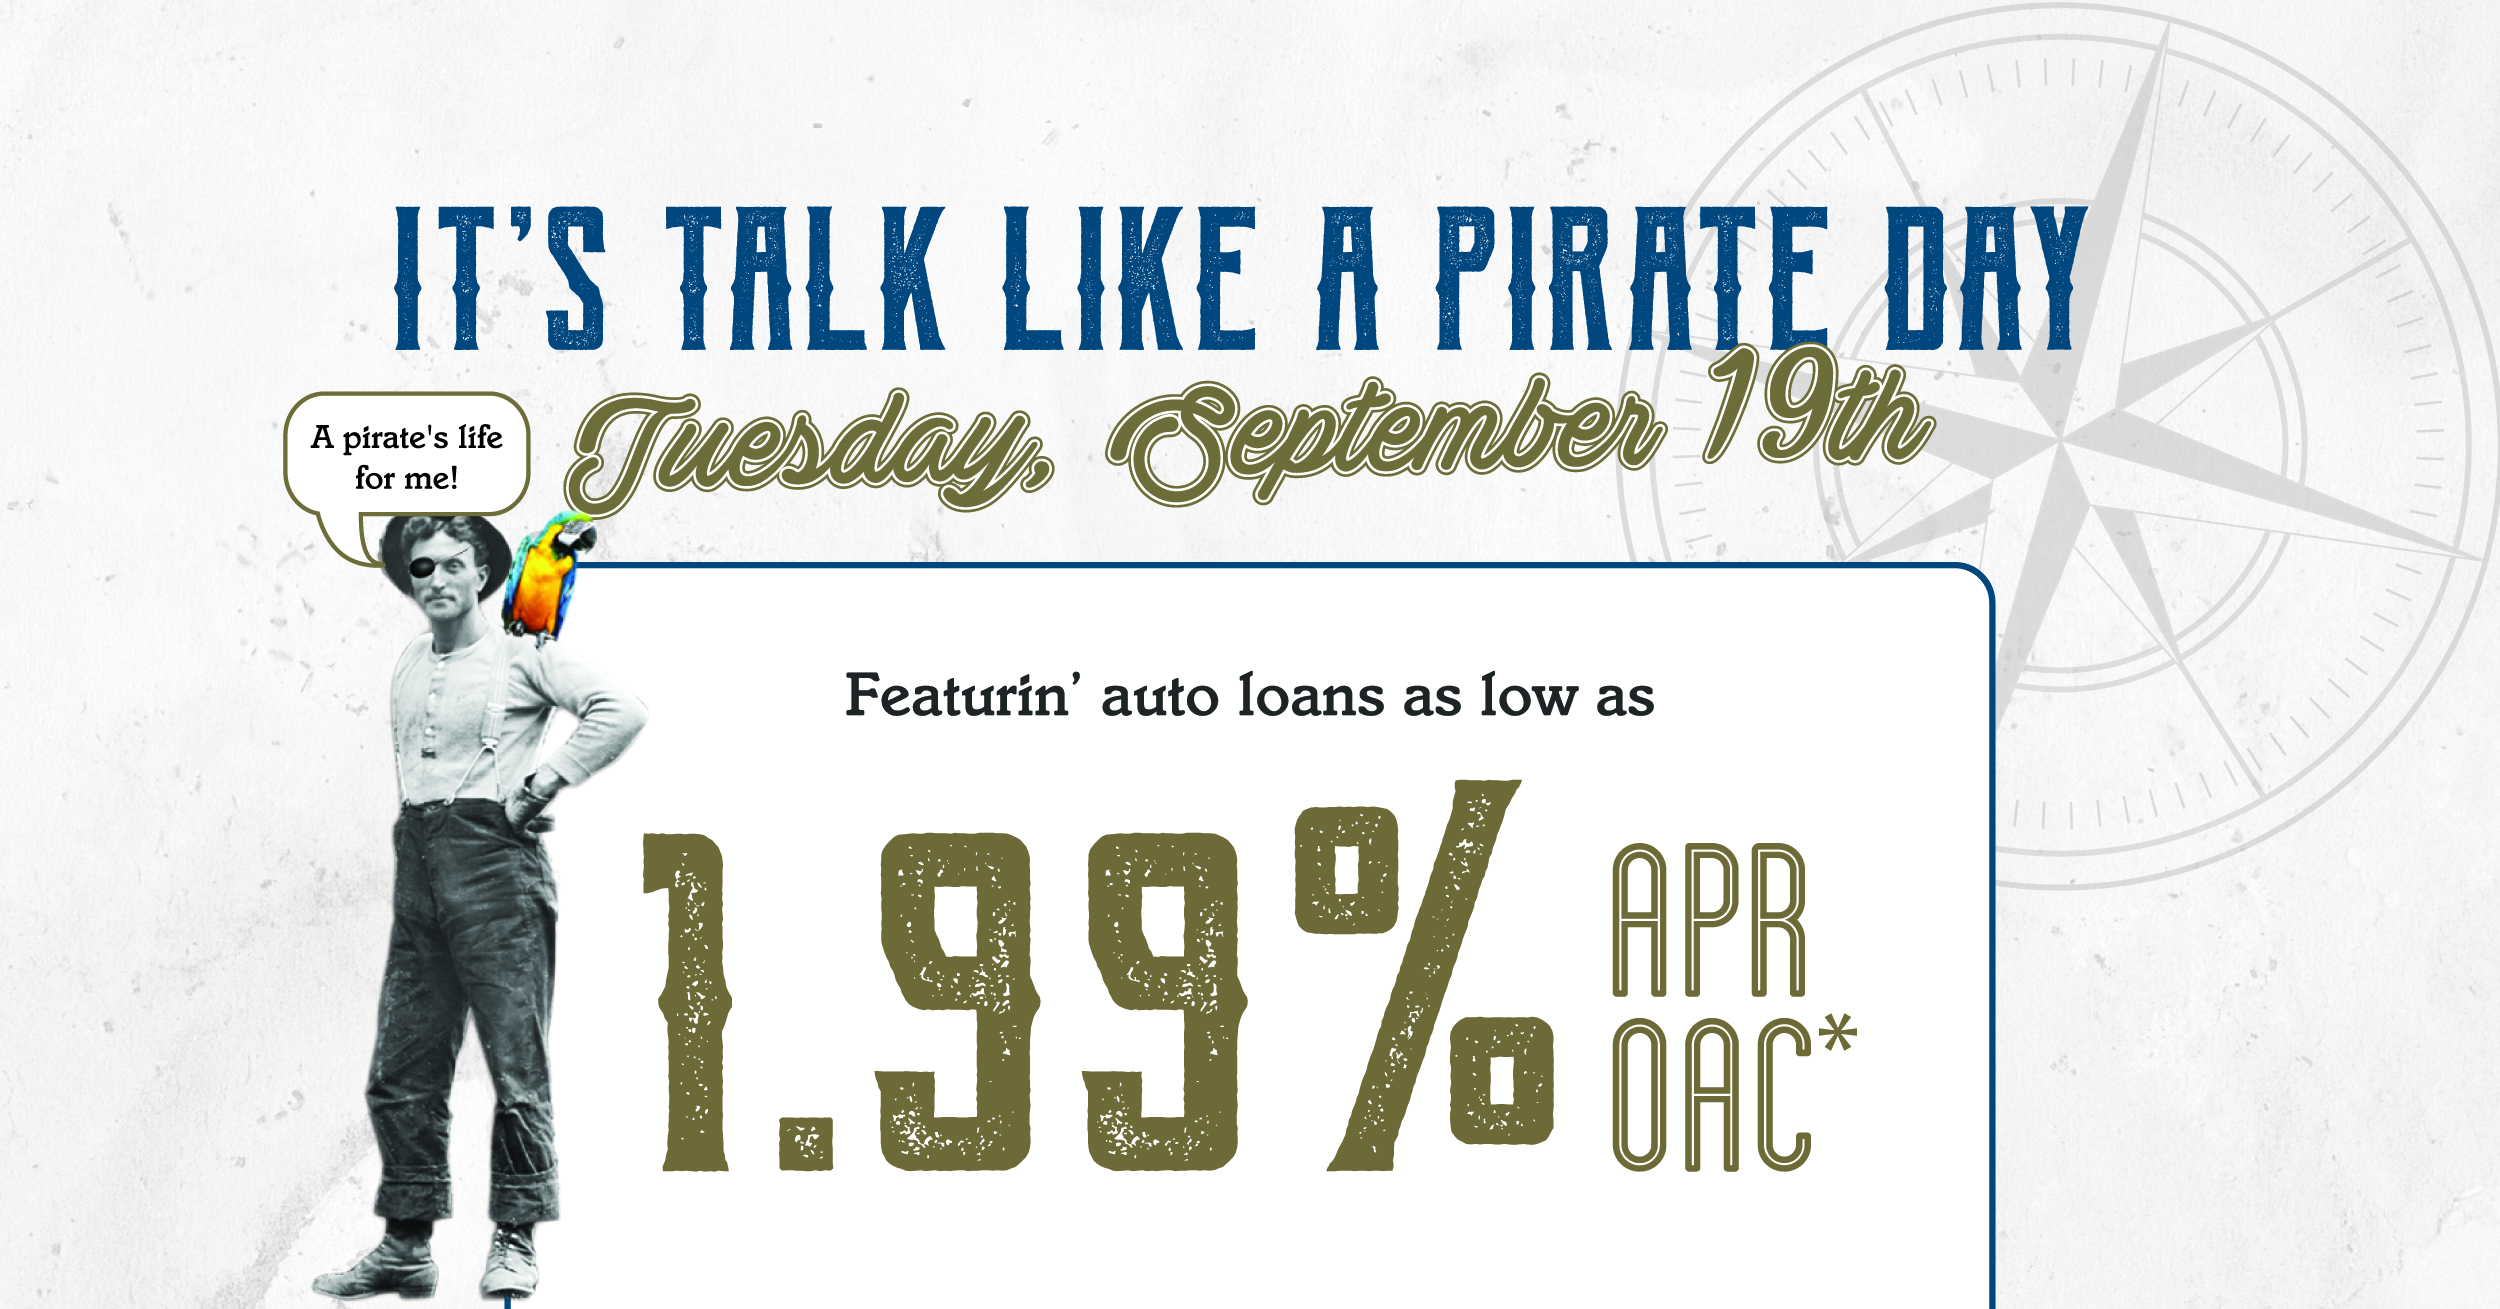 Pirate Day bounty awaits!